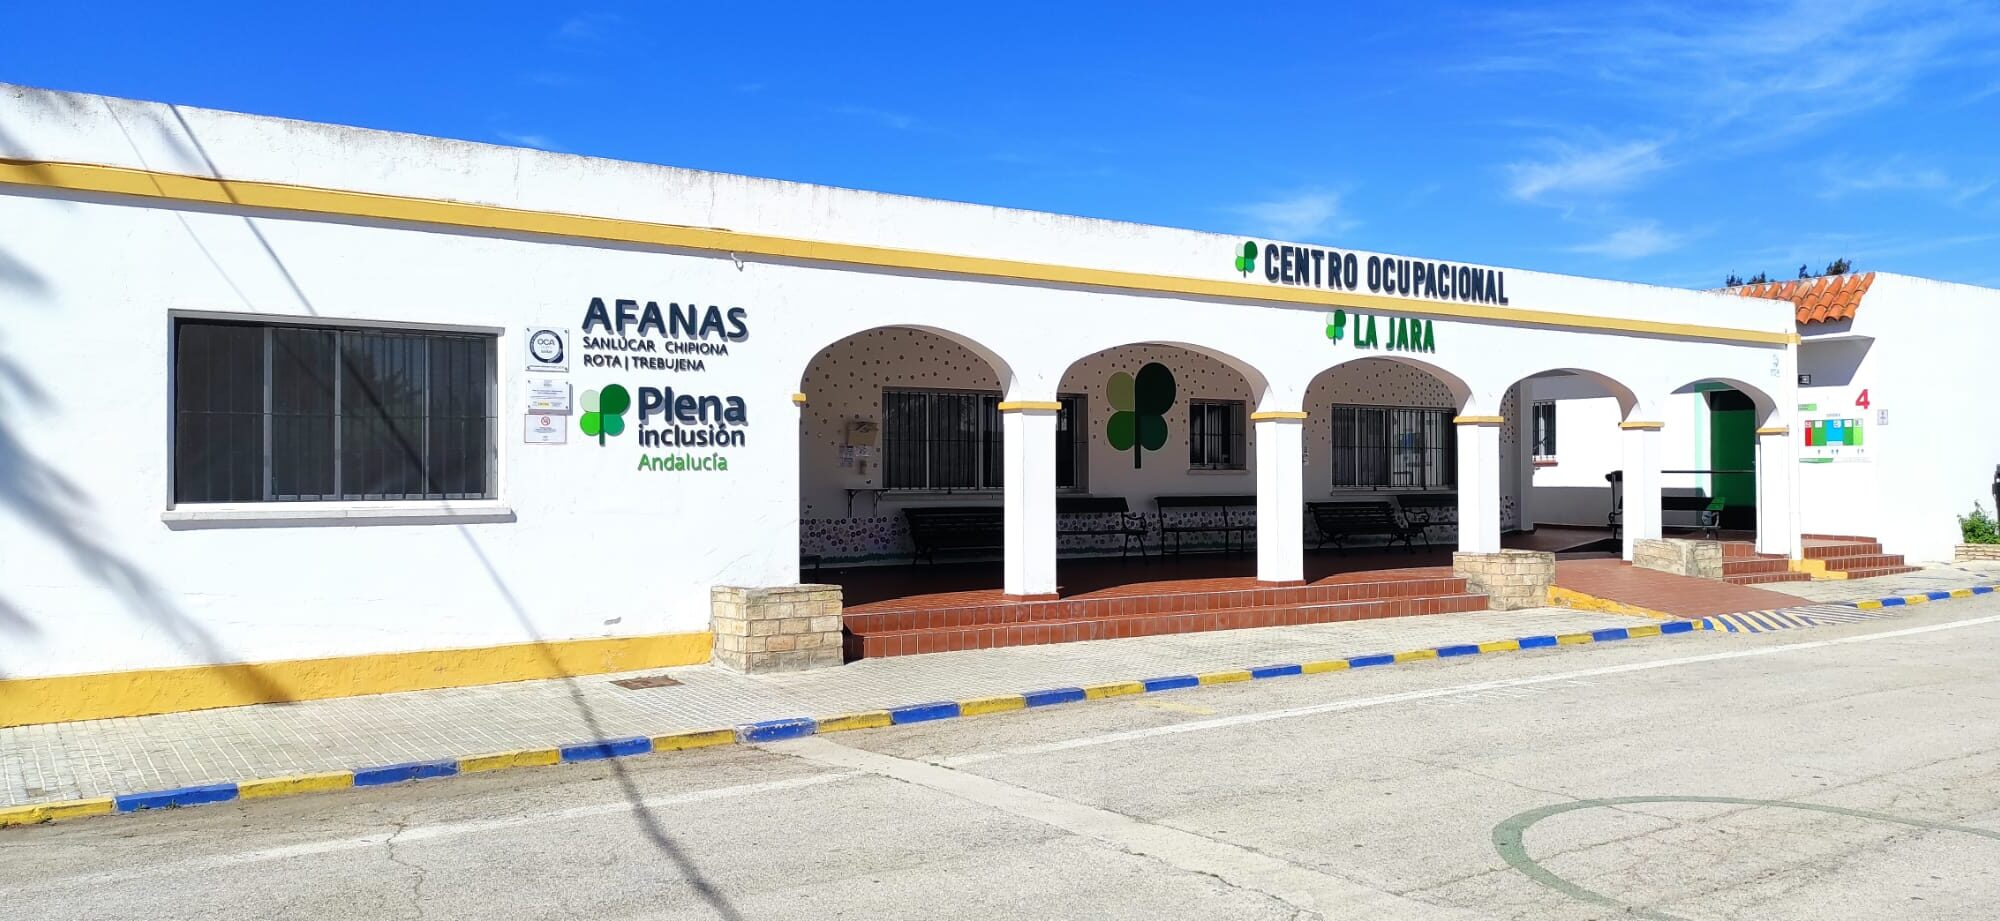 Centro Ocupacional La JARA